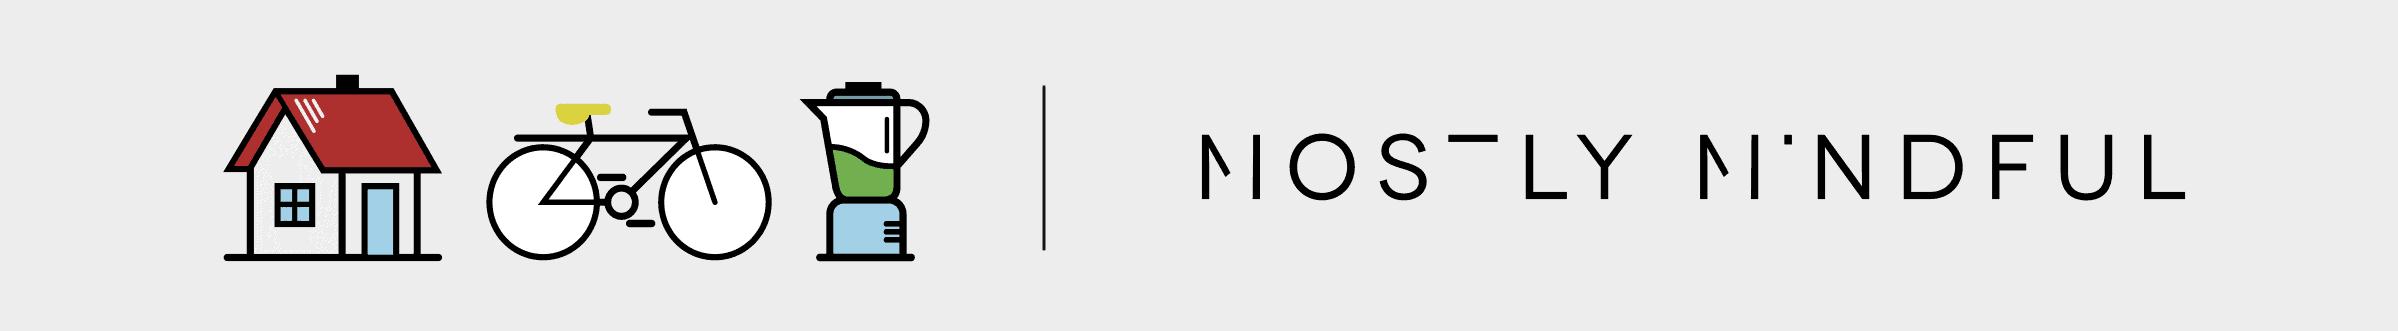 minimalist lifestyle blog